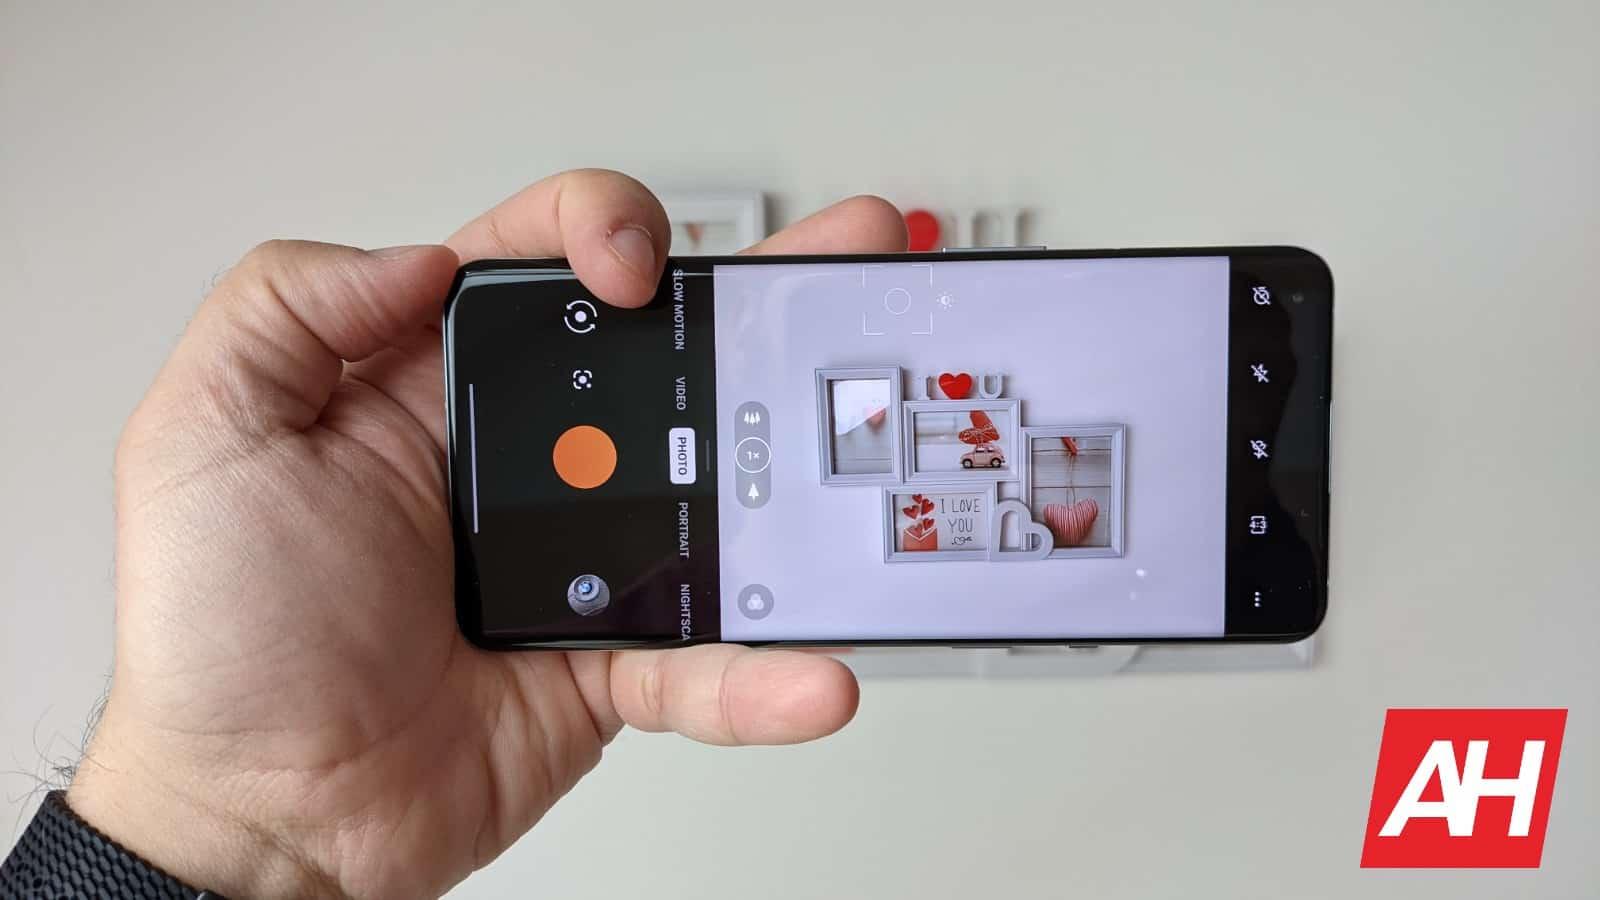 AH OnePlus 9 Pro KL image 77